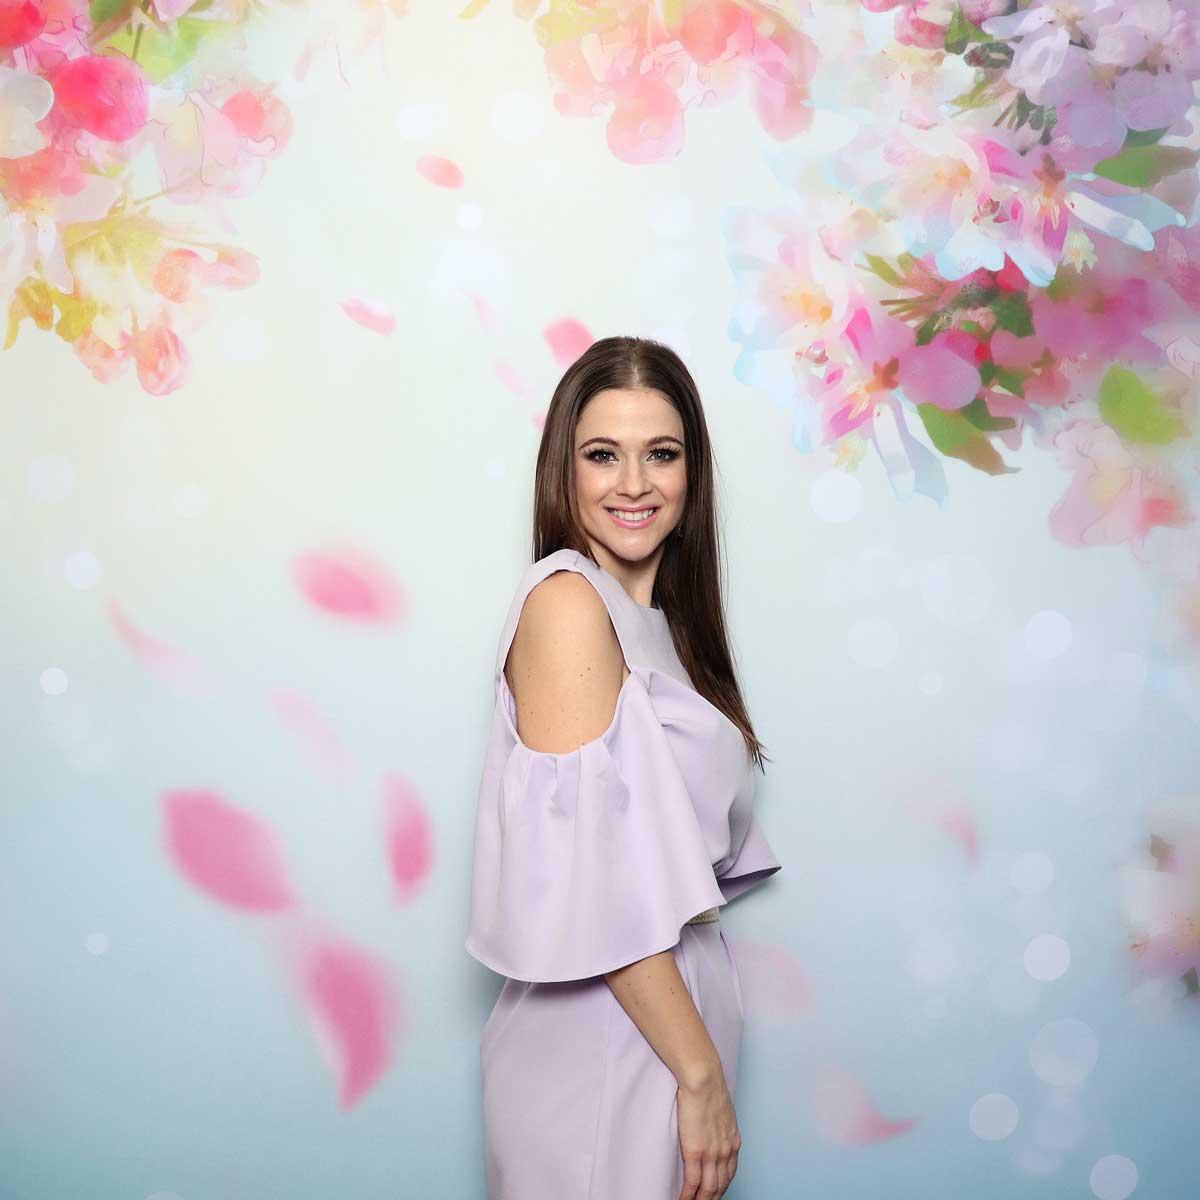 cherry blossom video overlay fotokutik FOTOKÚTIK.sk